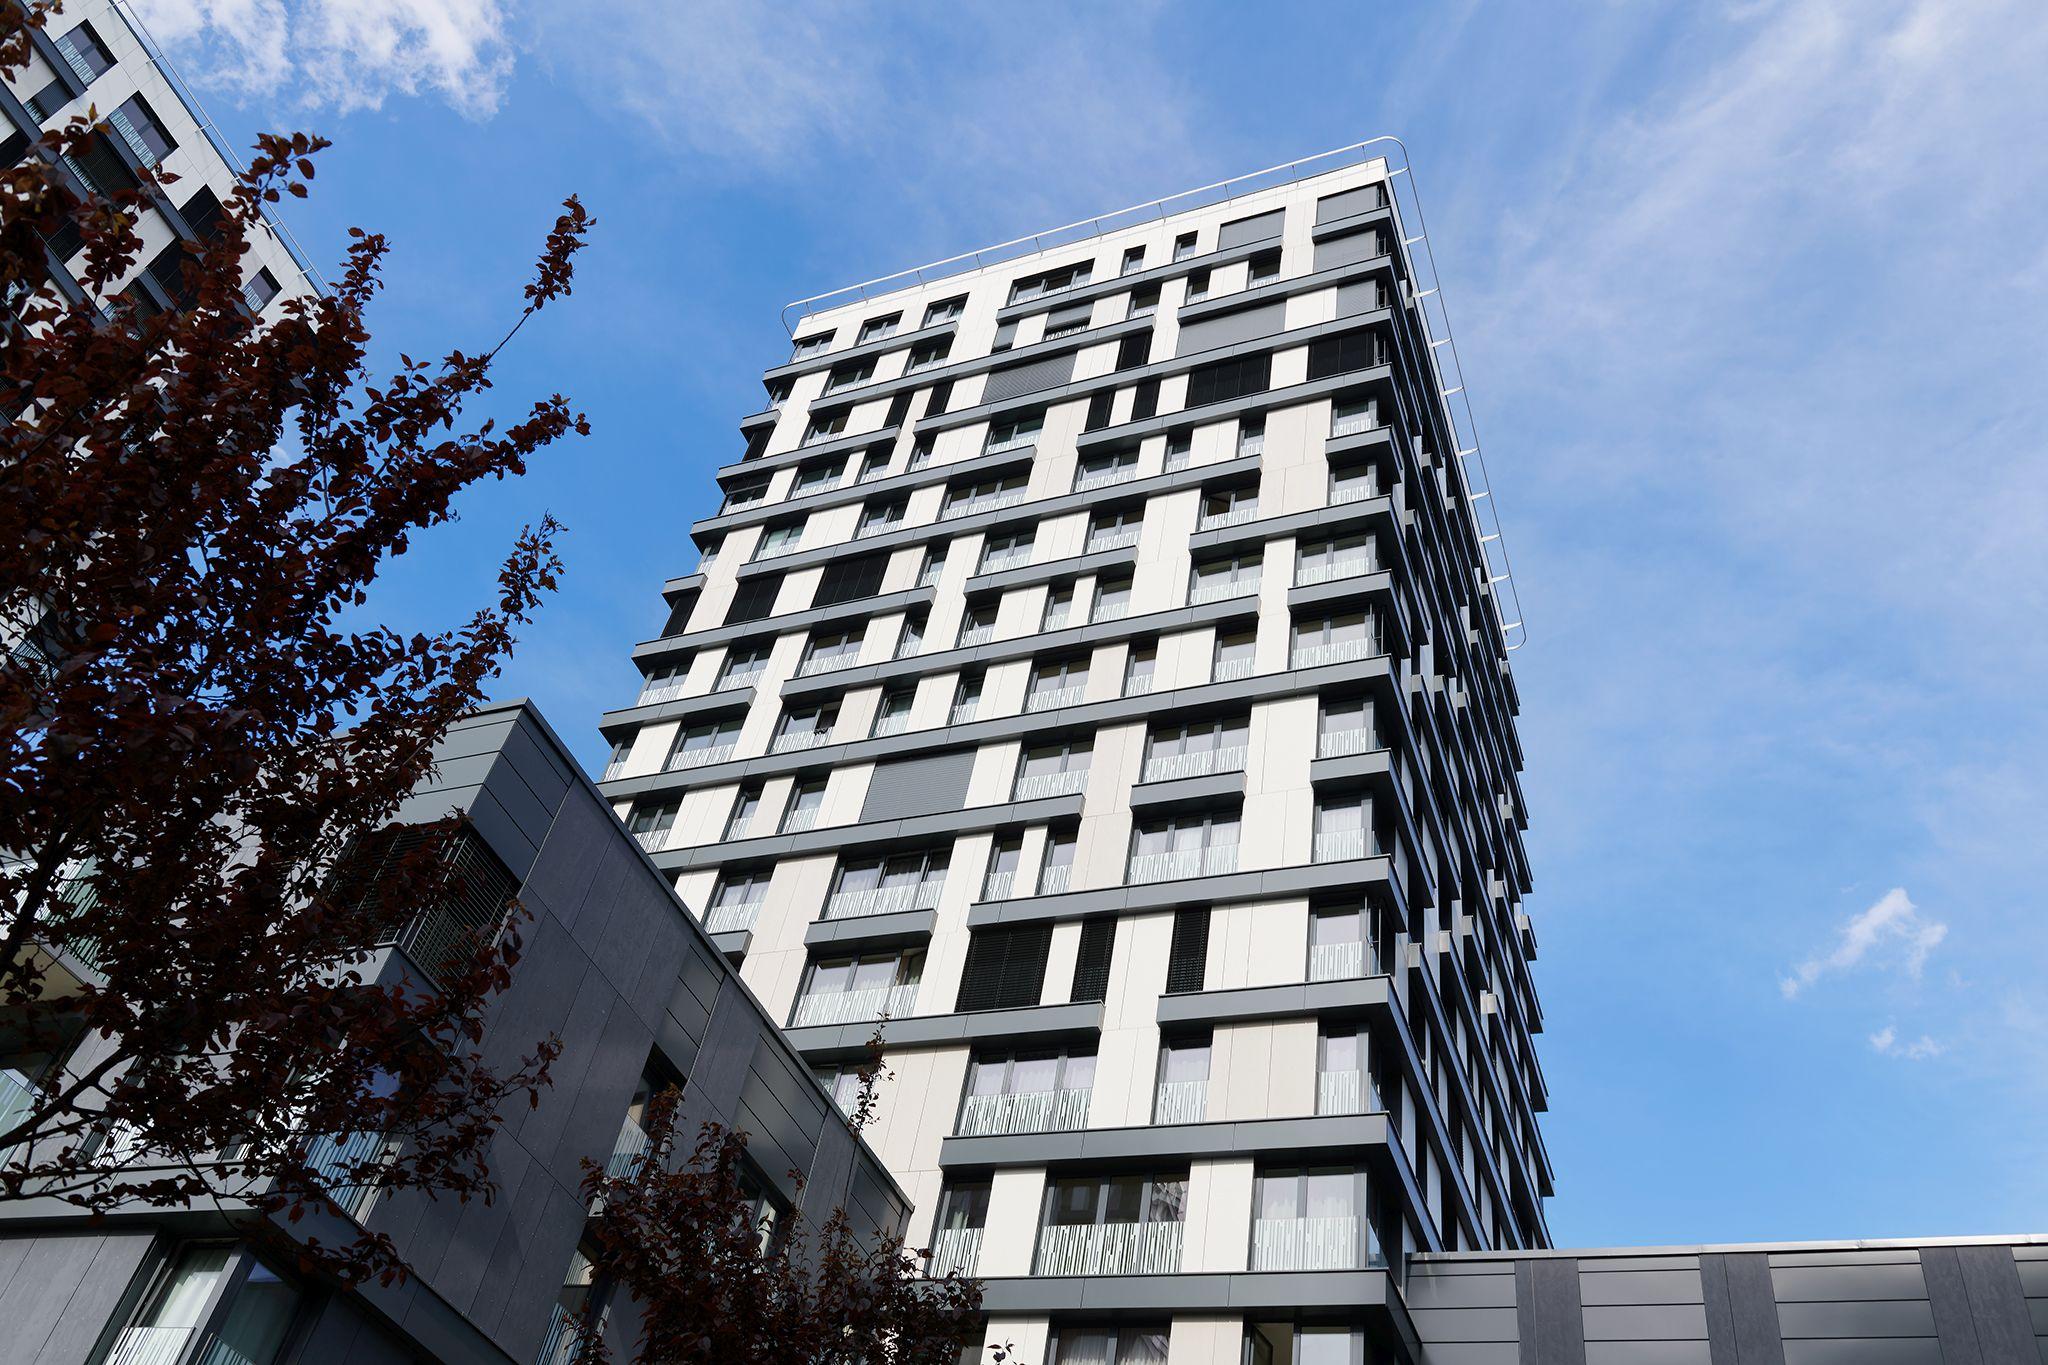 Garden Towers Residence